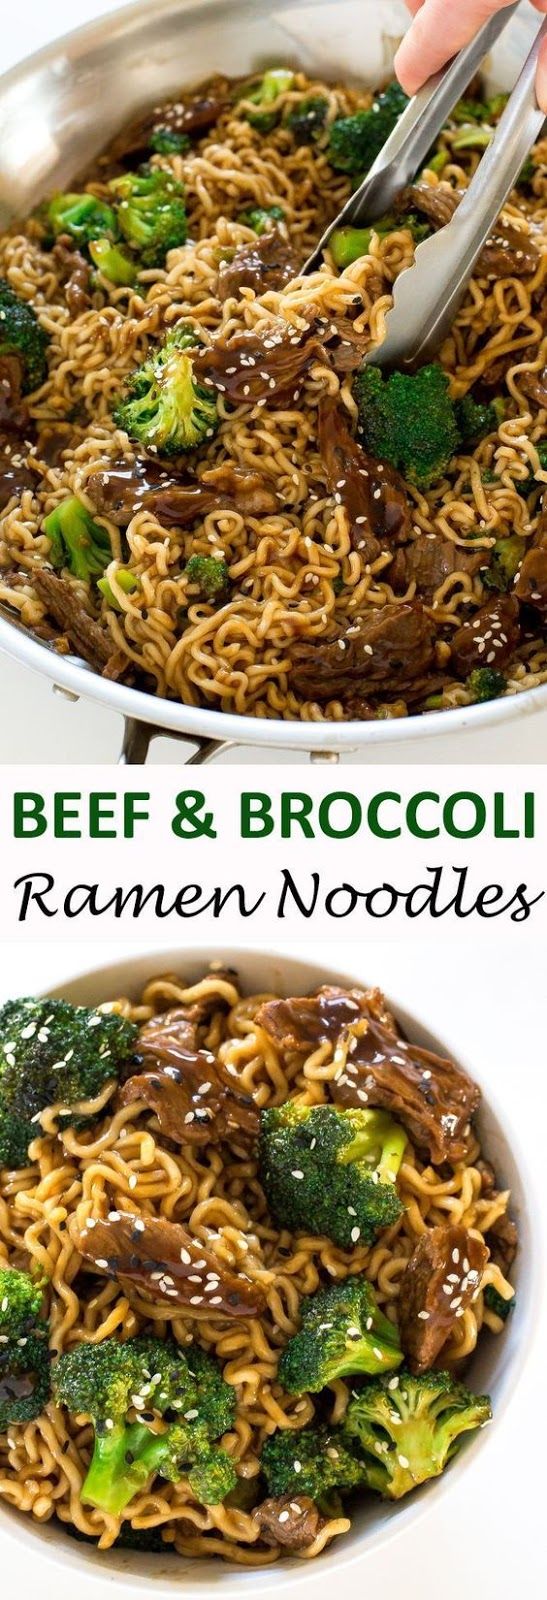 Beef and Broccoli Ramen #beef #broccoli #ramen #broccoliramen #dinnerideas #dinnerrecipes #easydinnerrecipes